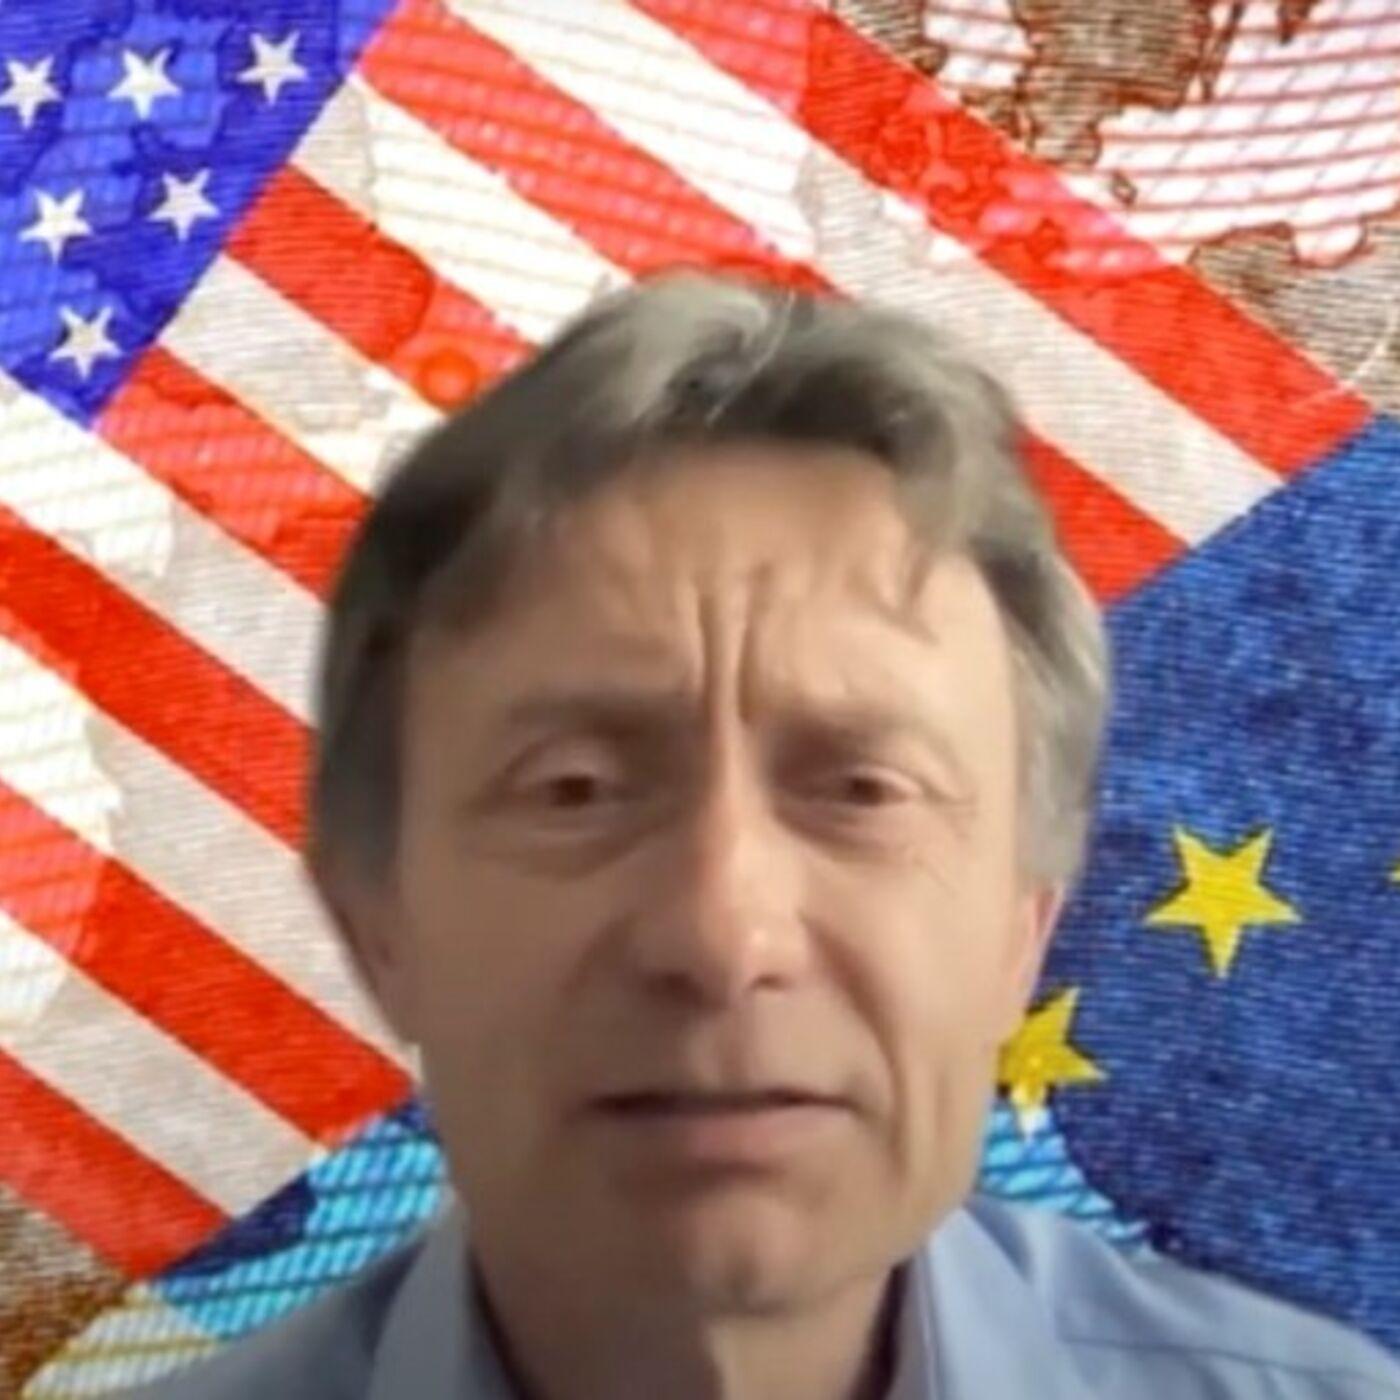 Pax Transatlantica – Jussi Hanhimäki